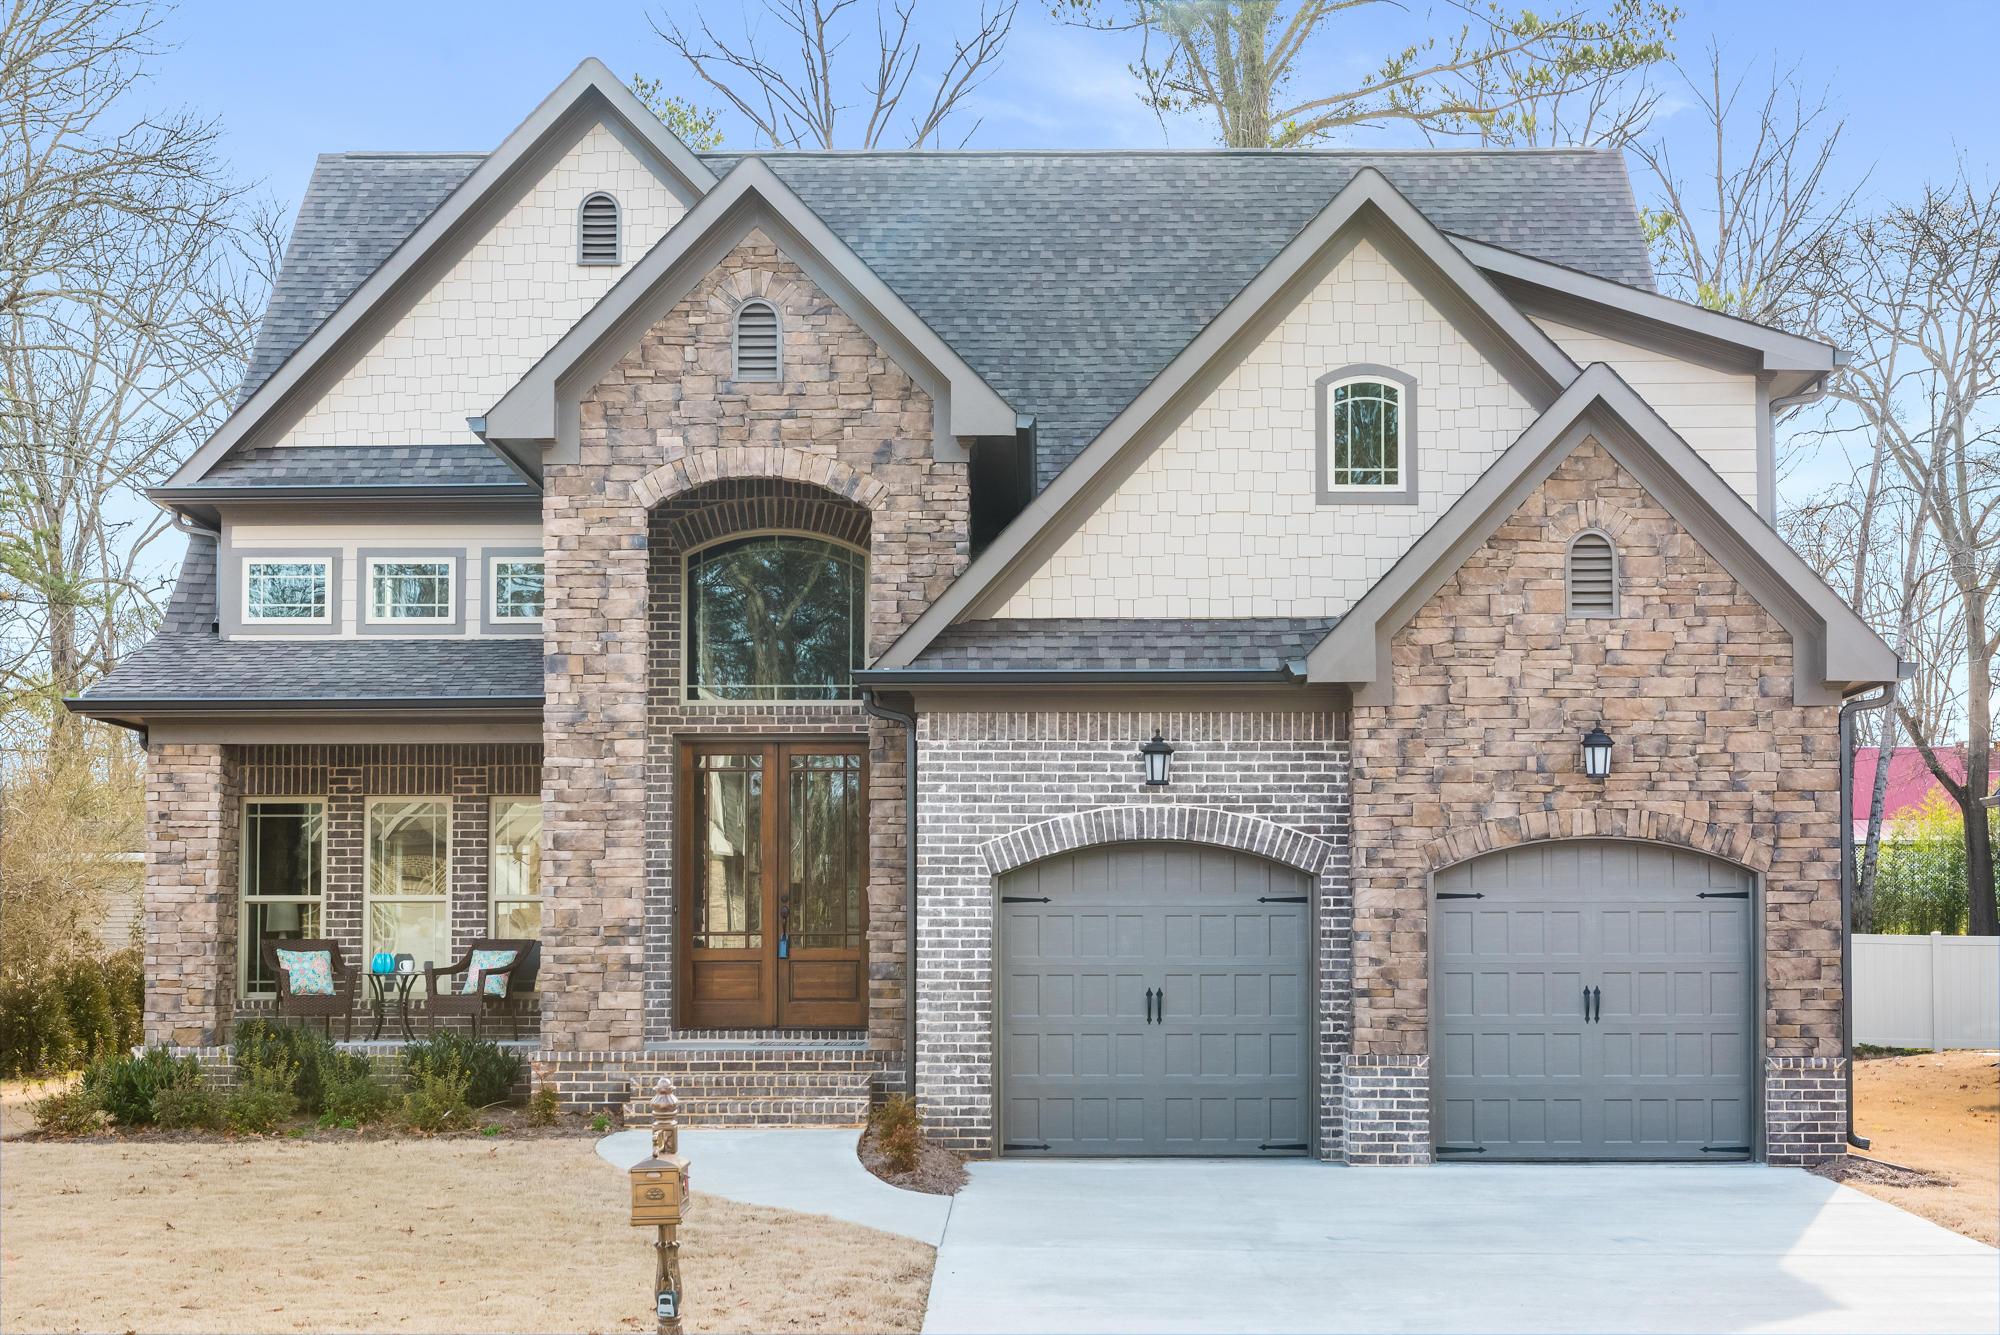 1010 Stone Ledge Ln, Chattanooga, TN 37421